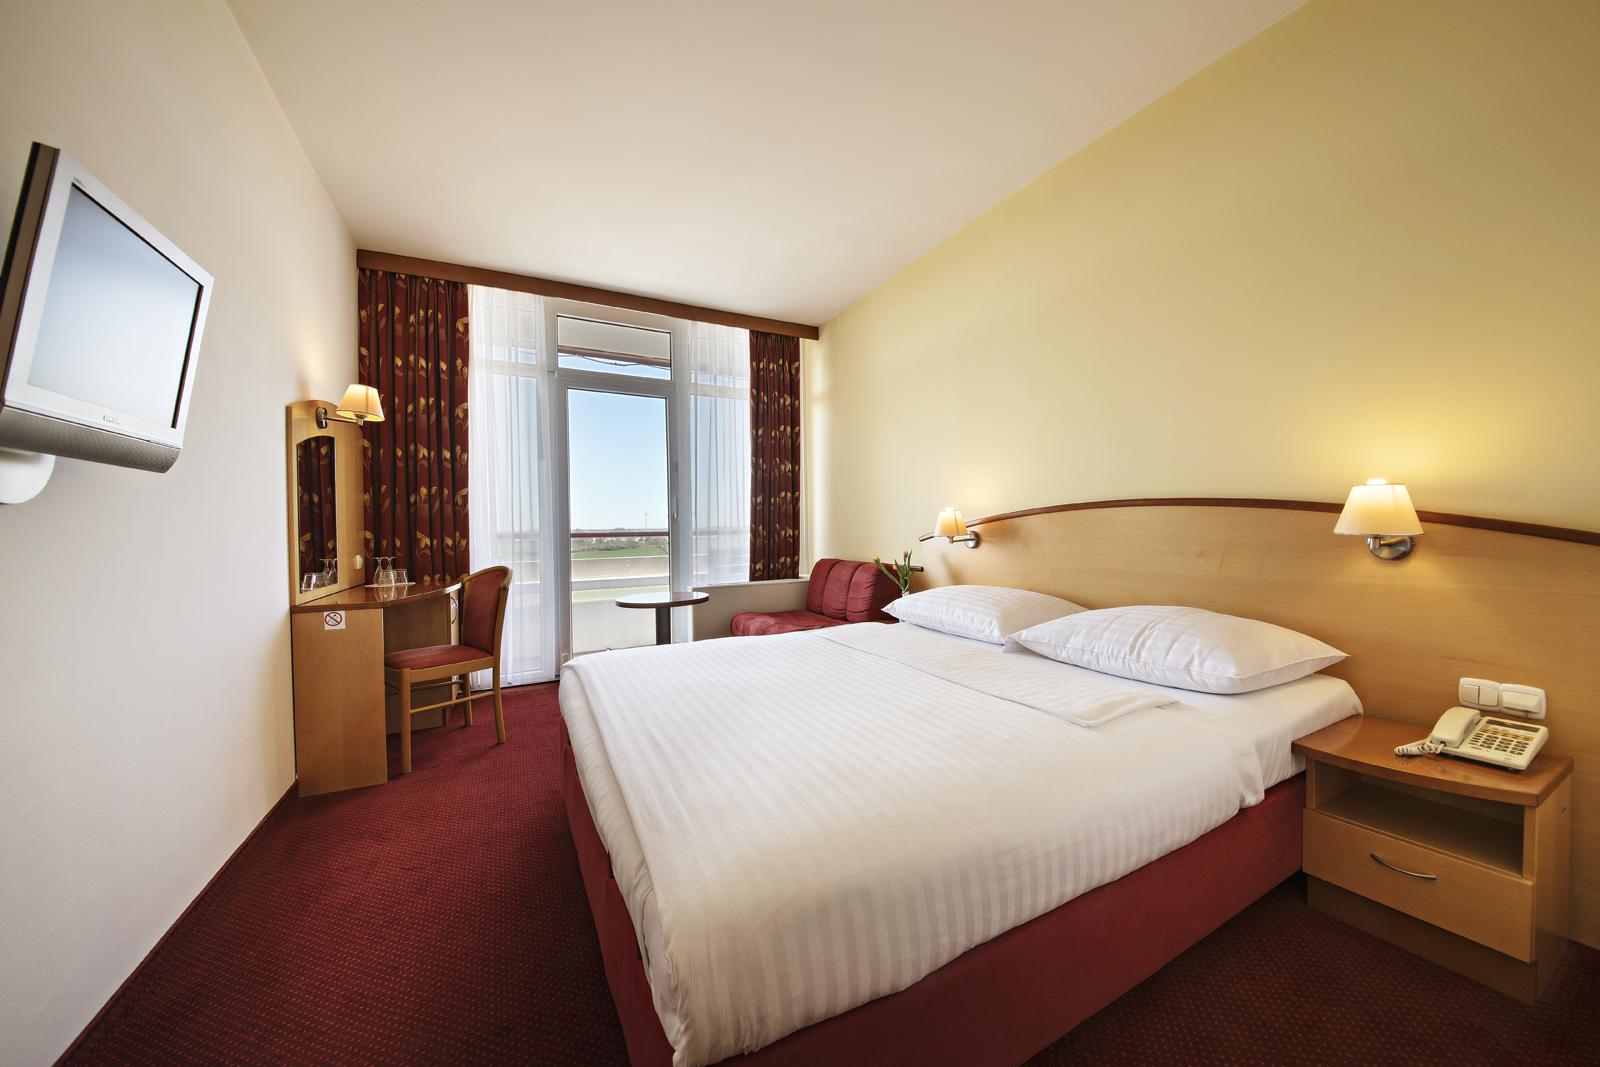 HotelLipa_doubleroom_01_052017_DD_lowres